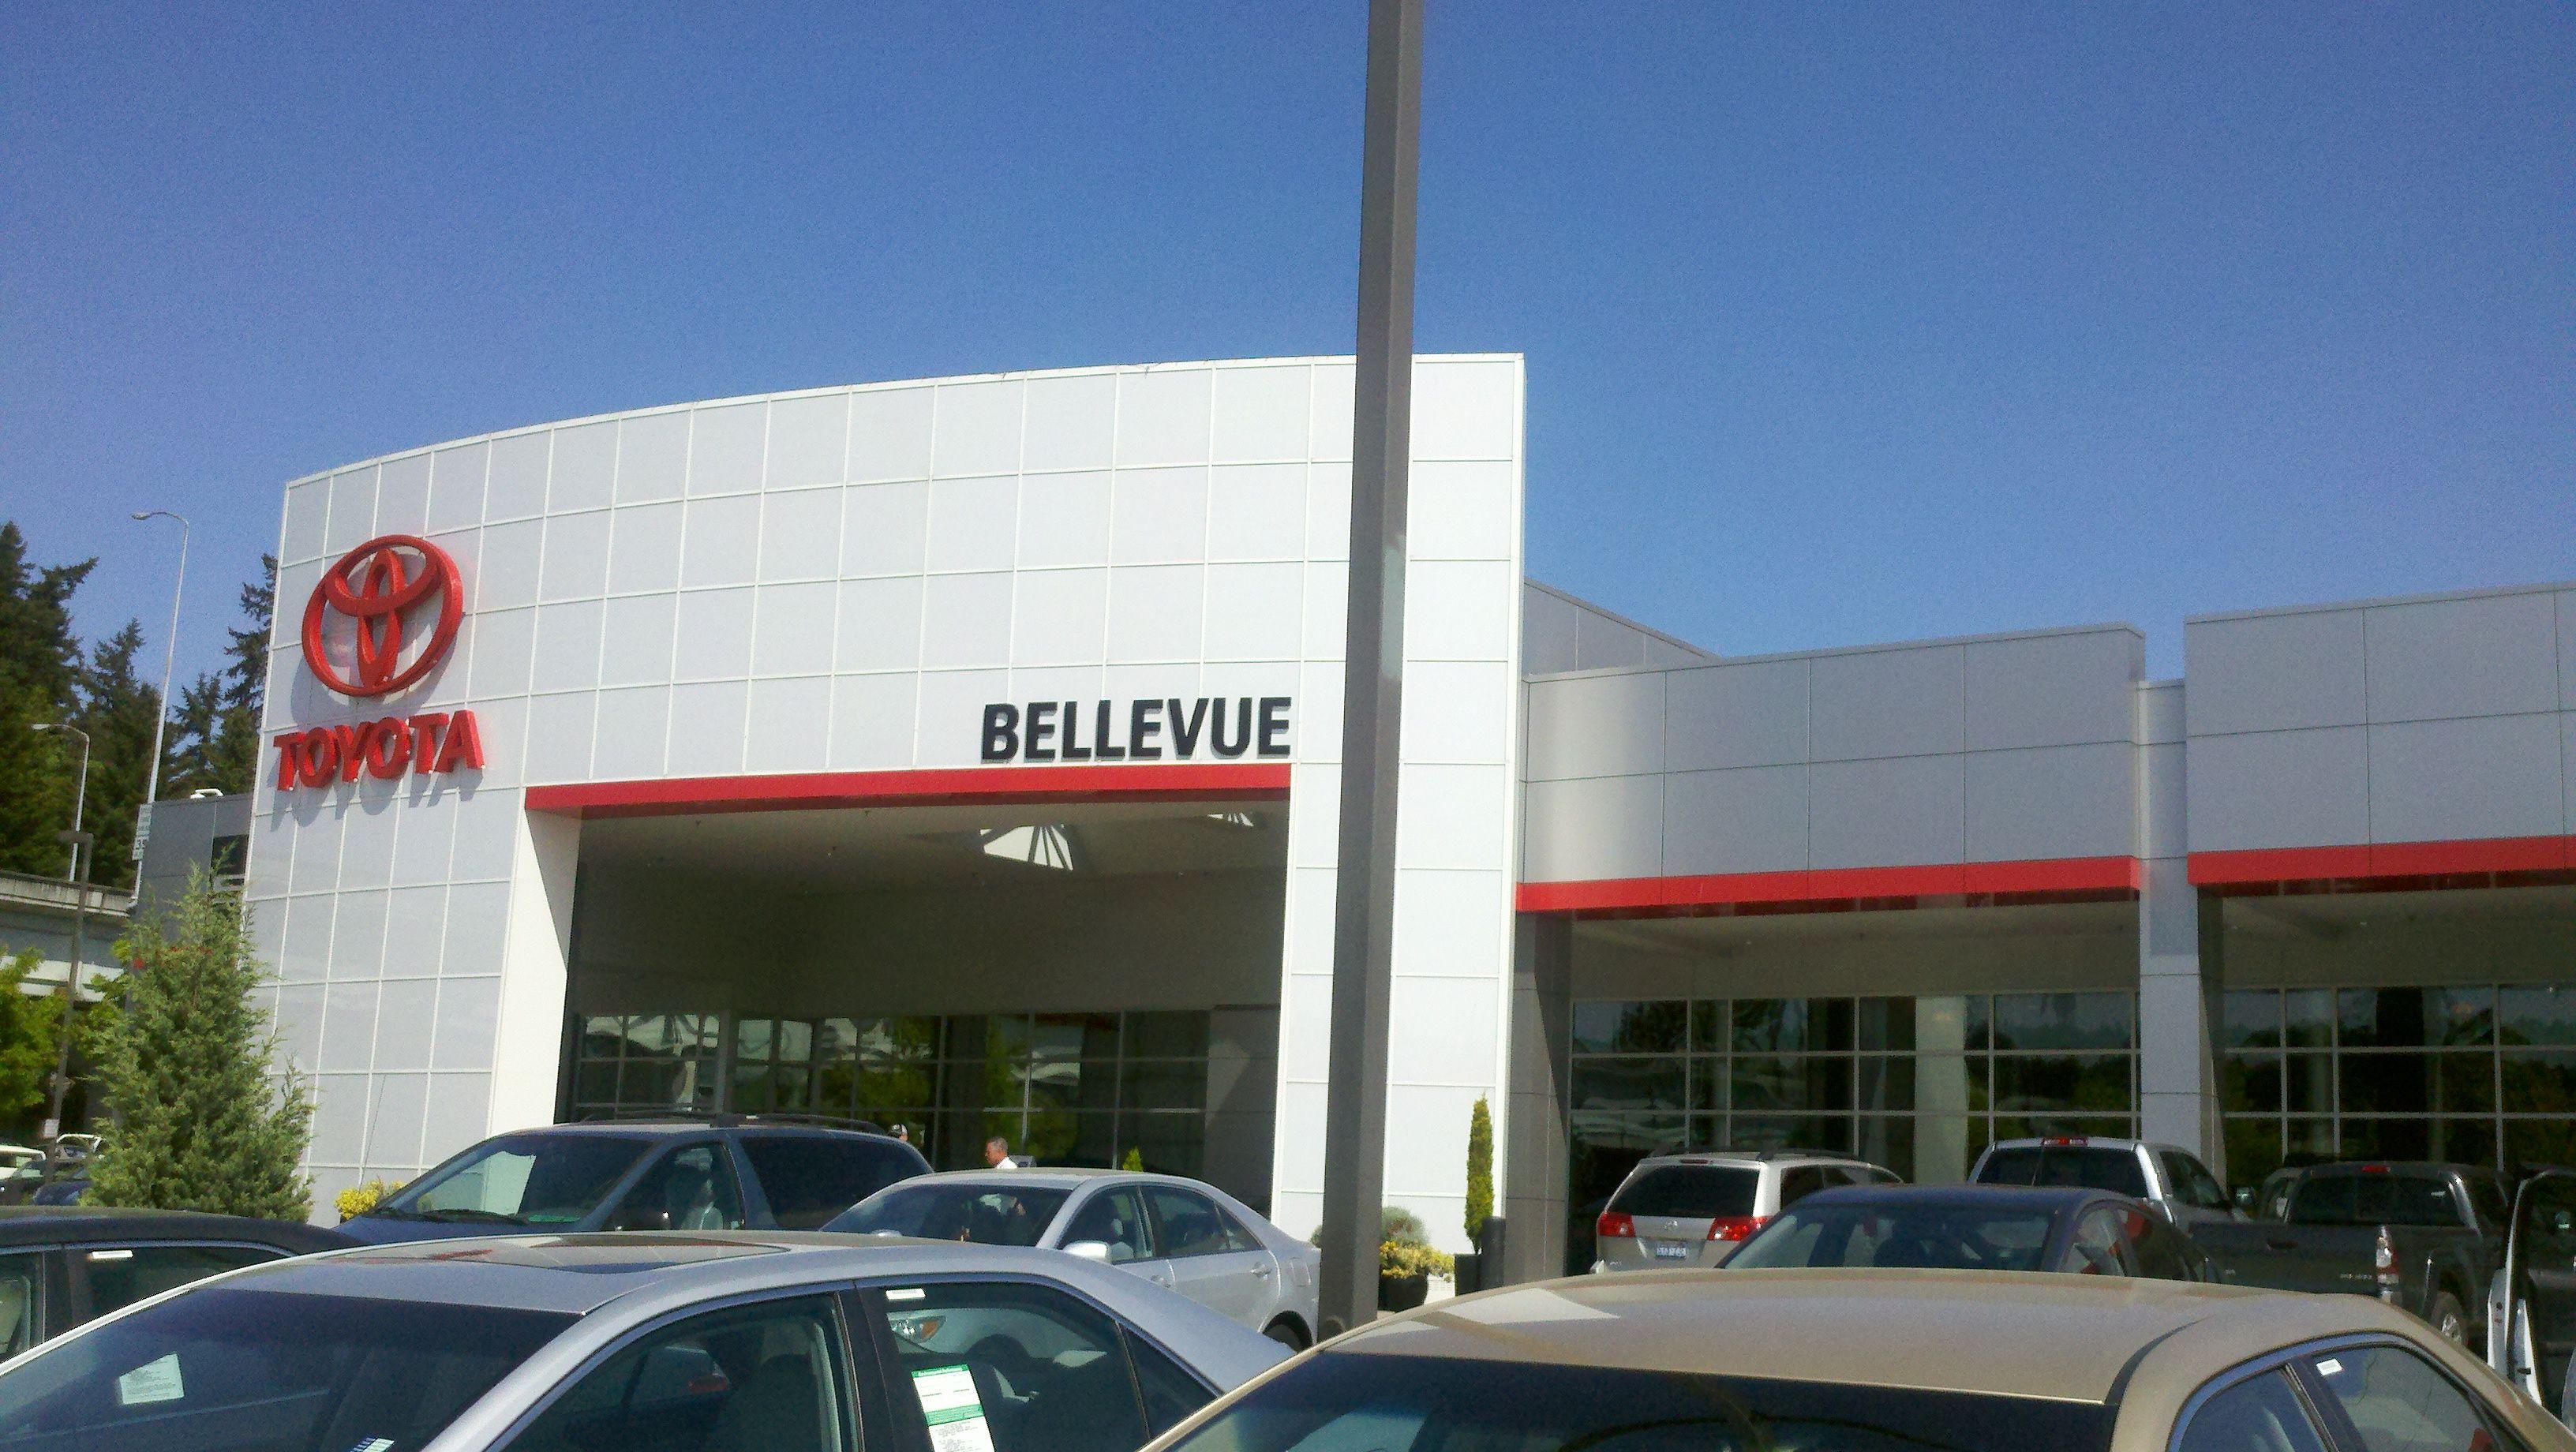 Toyota Of Bellevue Bellevue Dealership Toyota